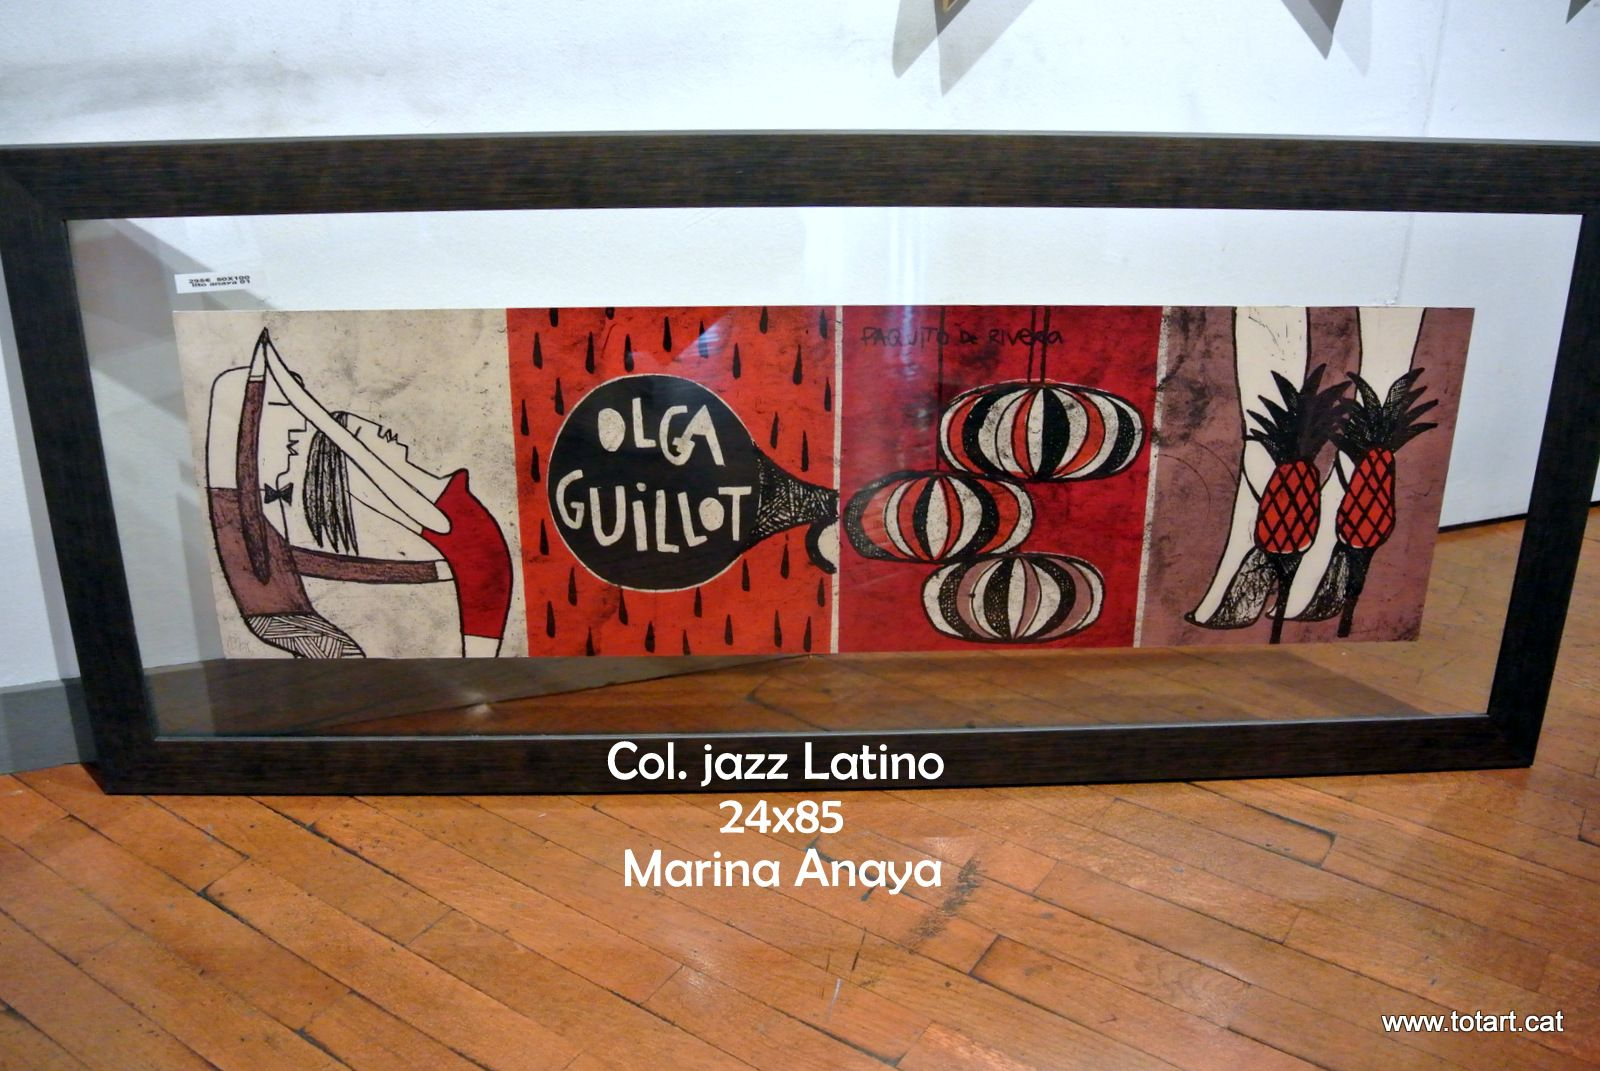 Litografia Coleccion Jazz Latino totart.cat #marinaanaya ...